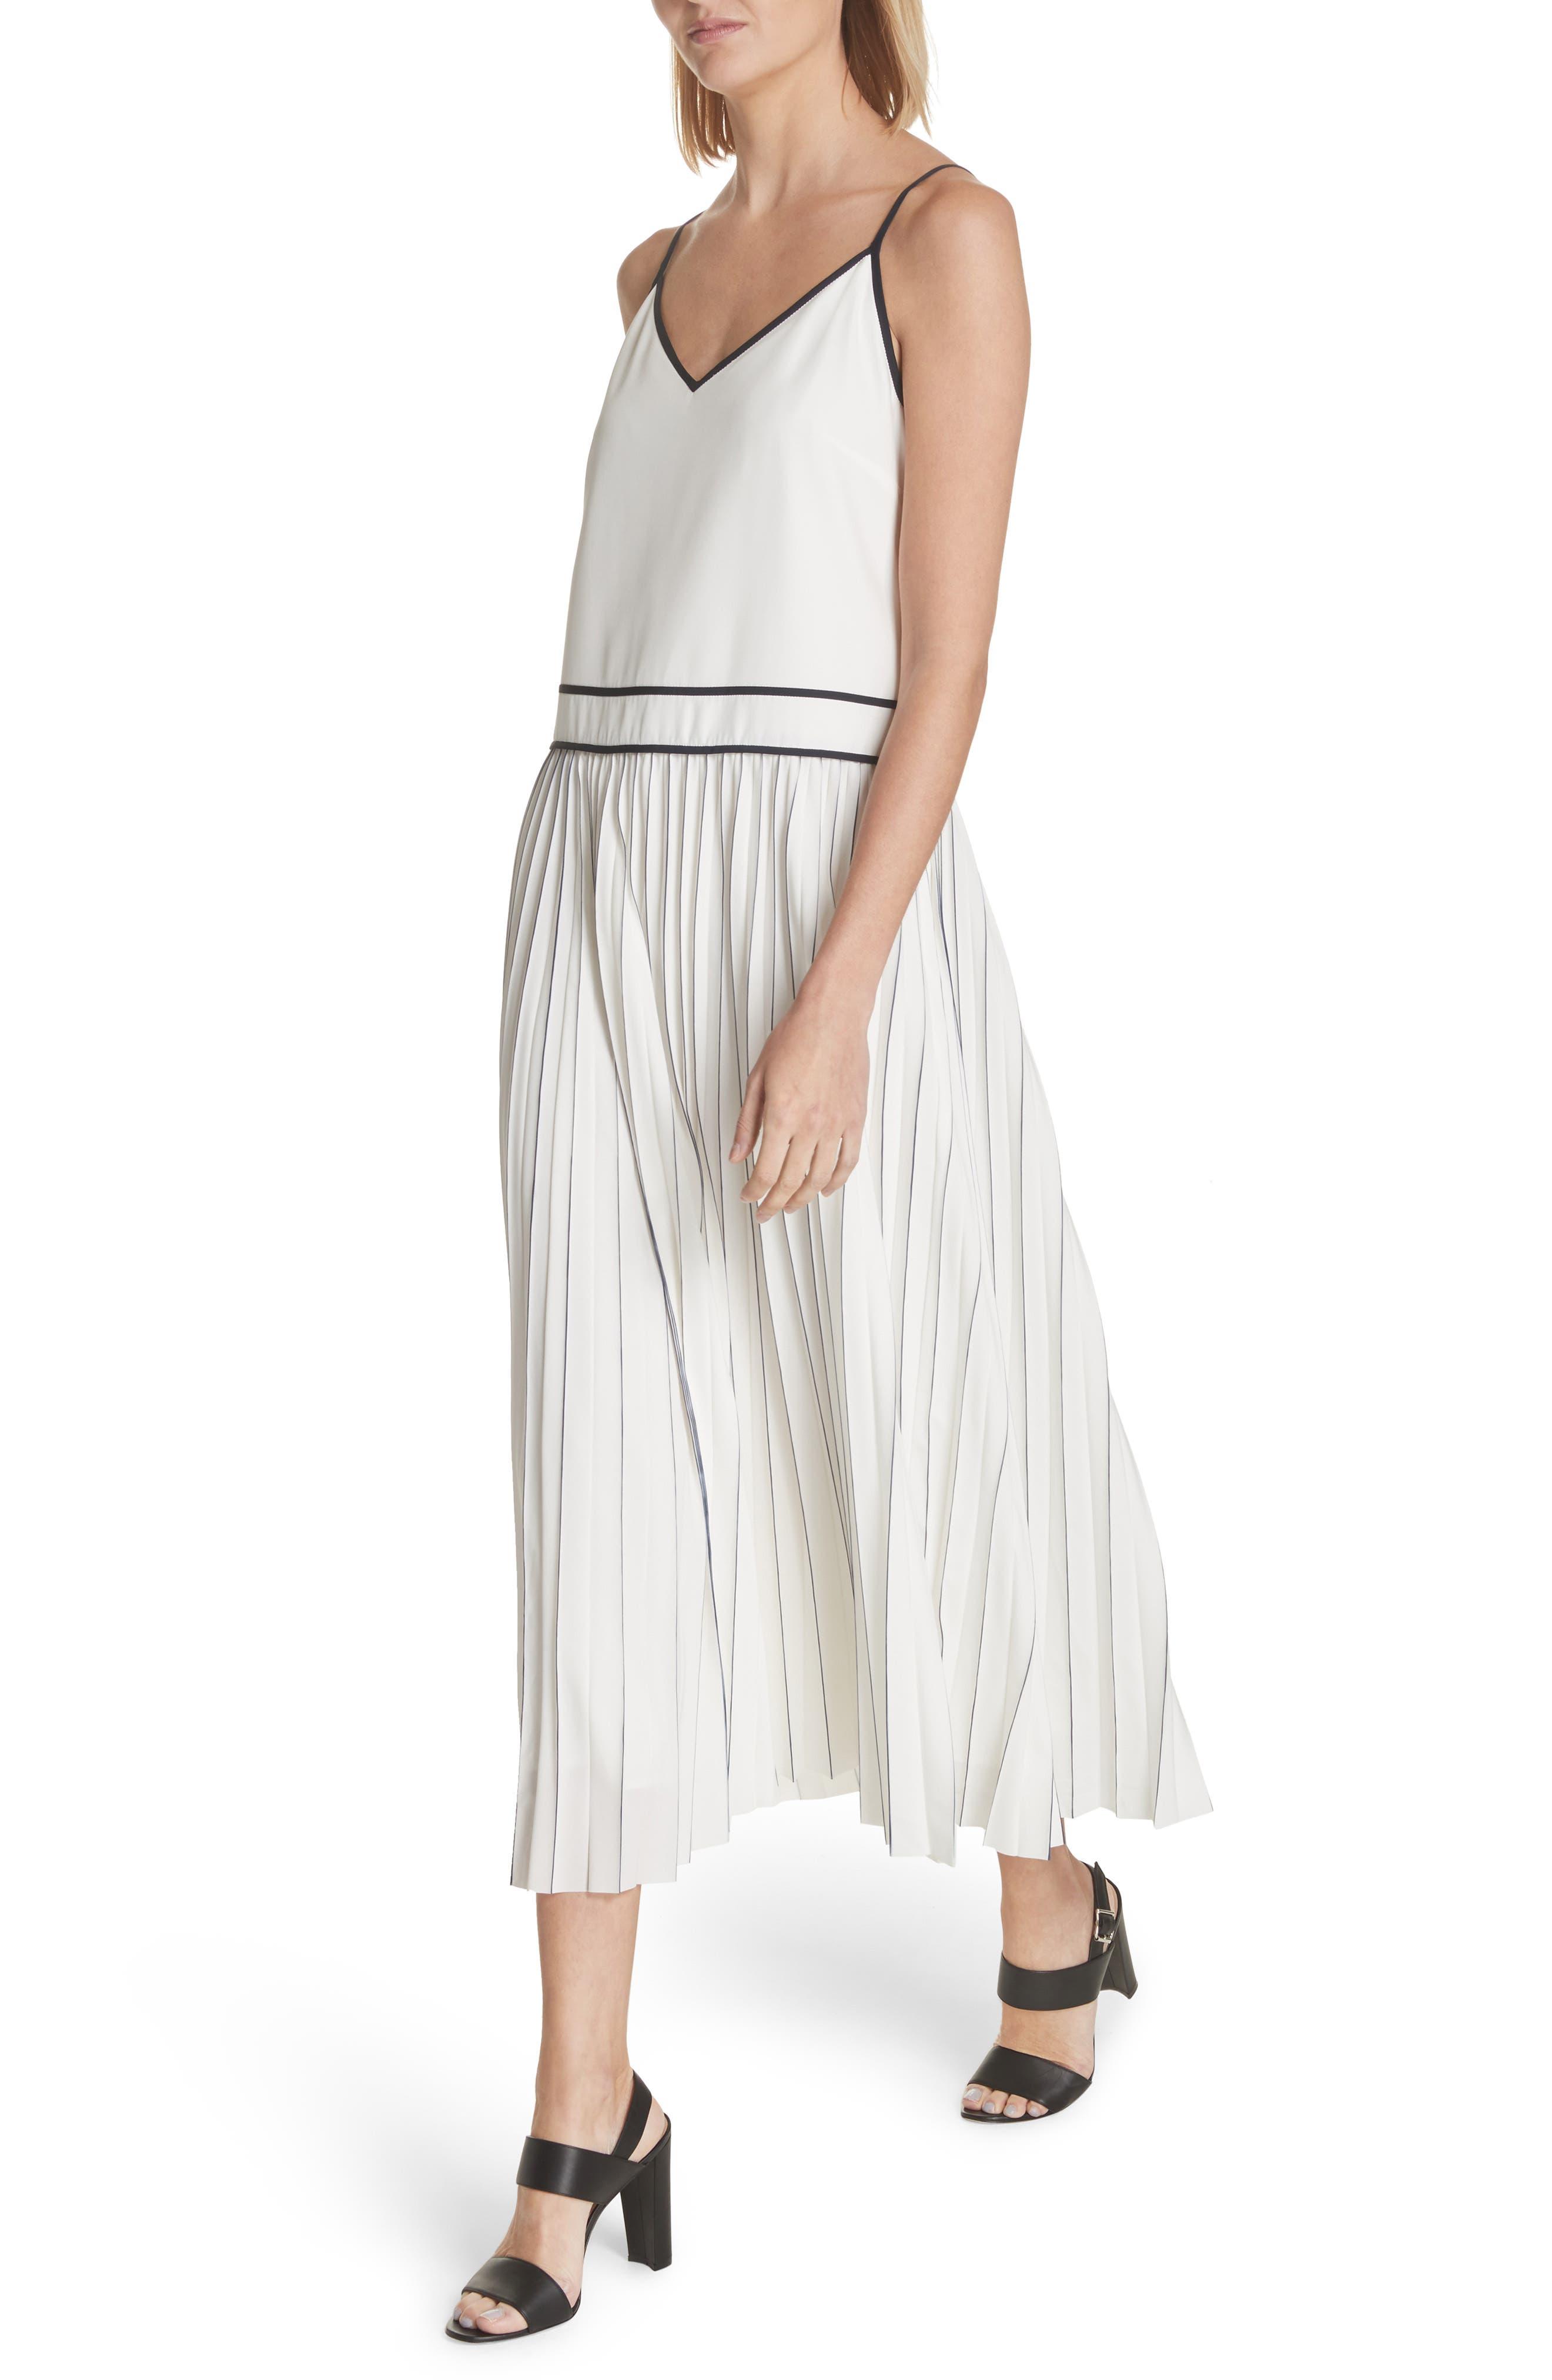 Silk Pleated Skirt Midi Dress,                             Alternate thumbnail 4, color,                             129